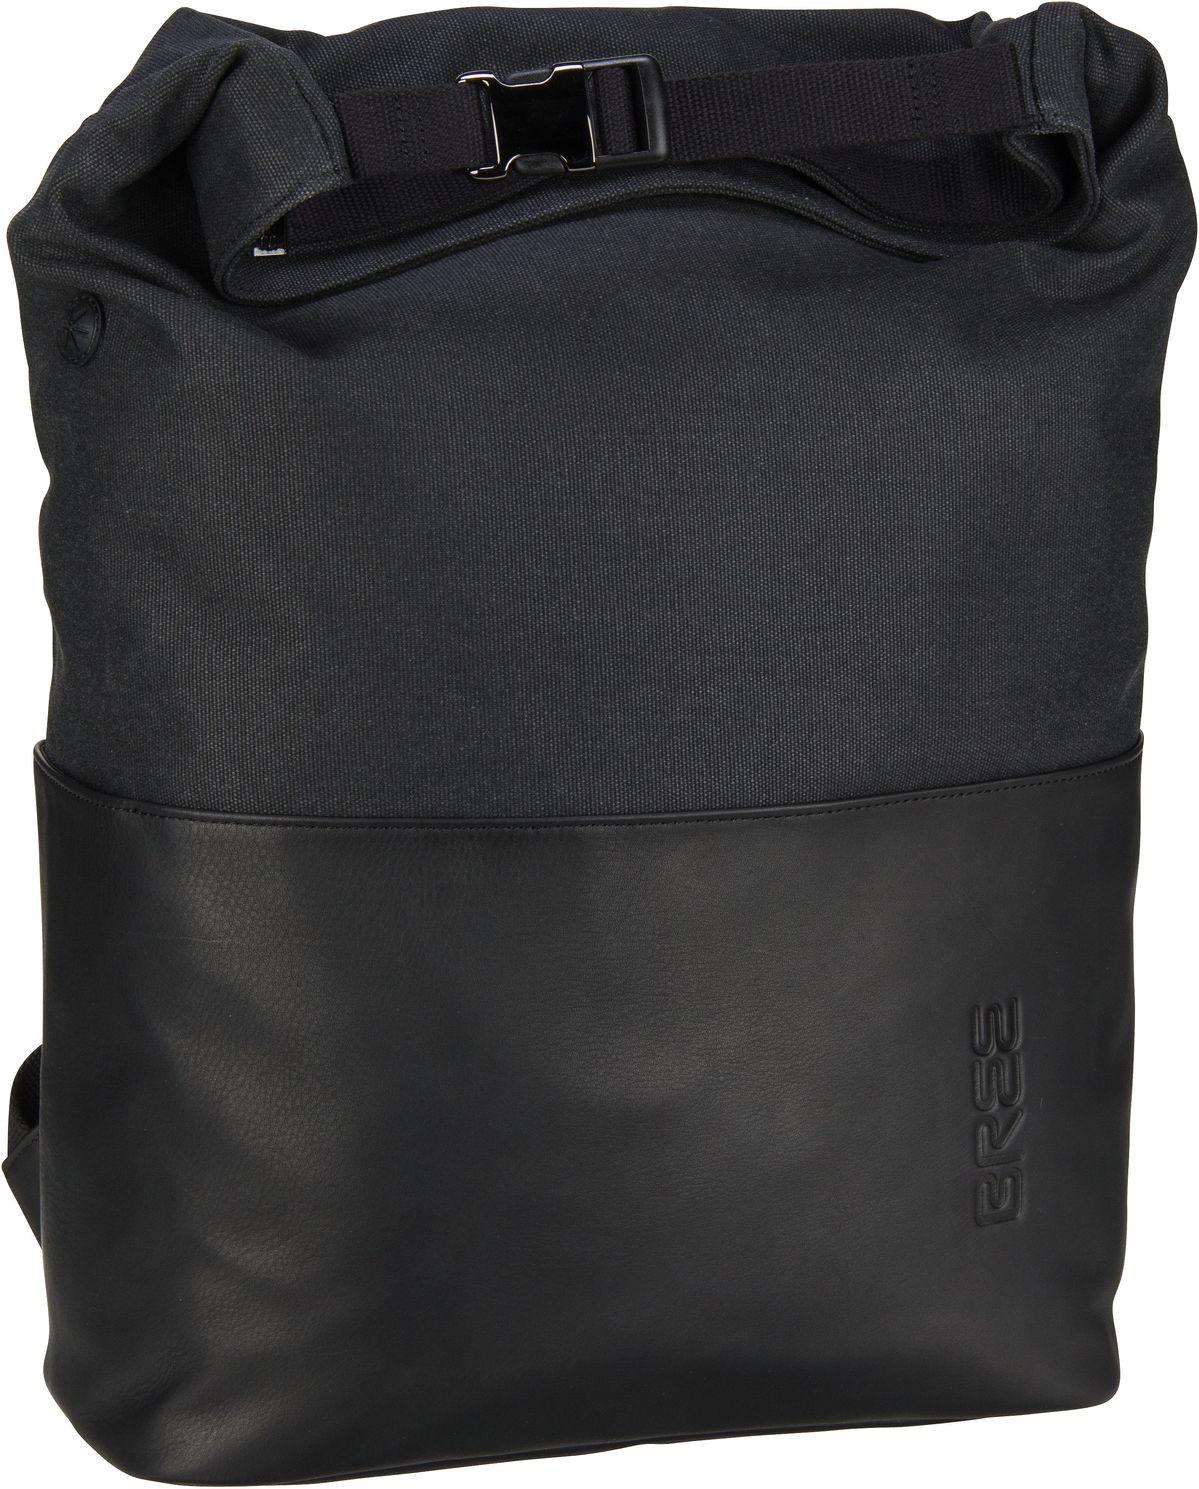 Rucksack / Daypack Punch Casual 733 Anthra/Black (27 Liter)